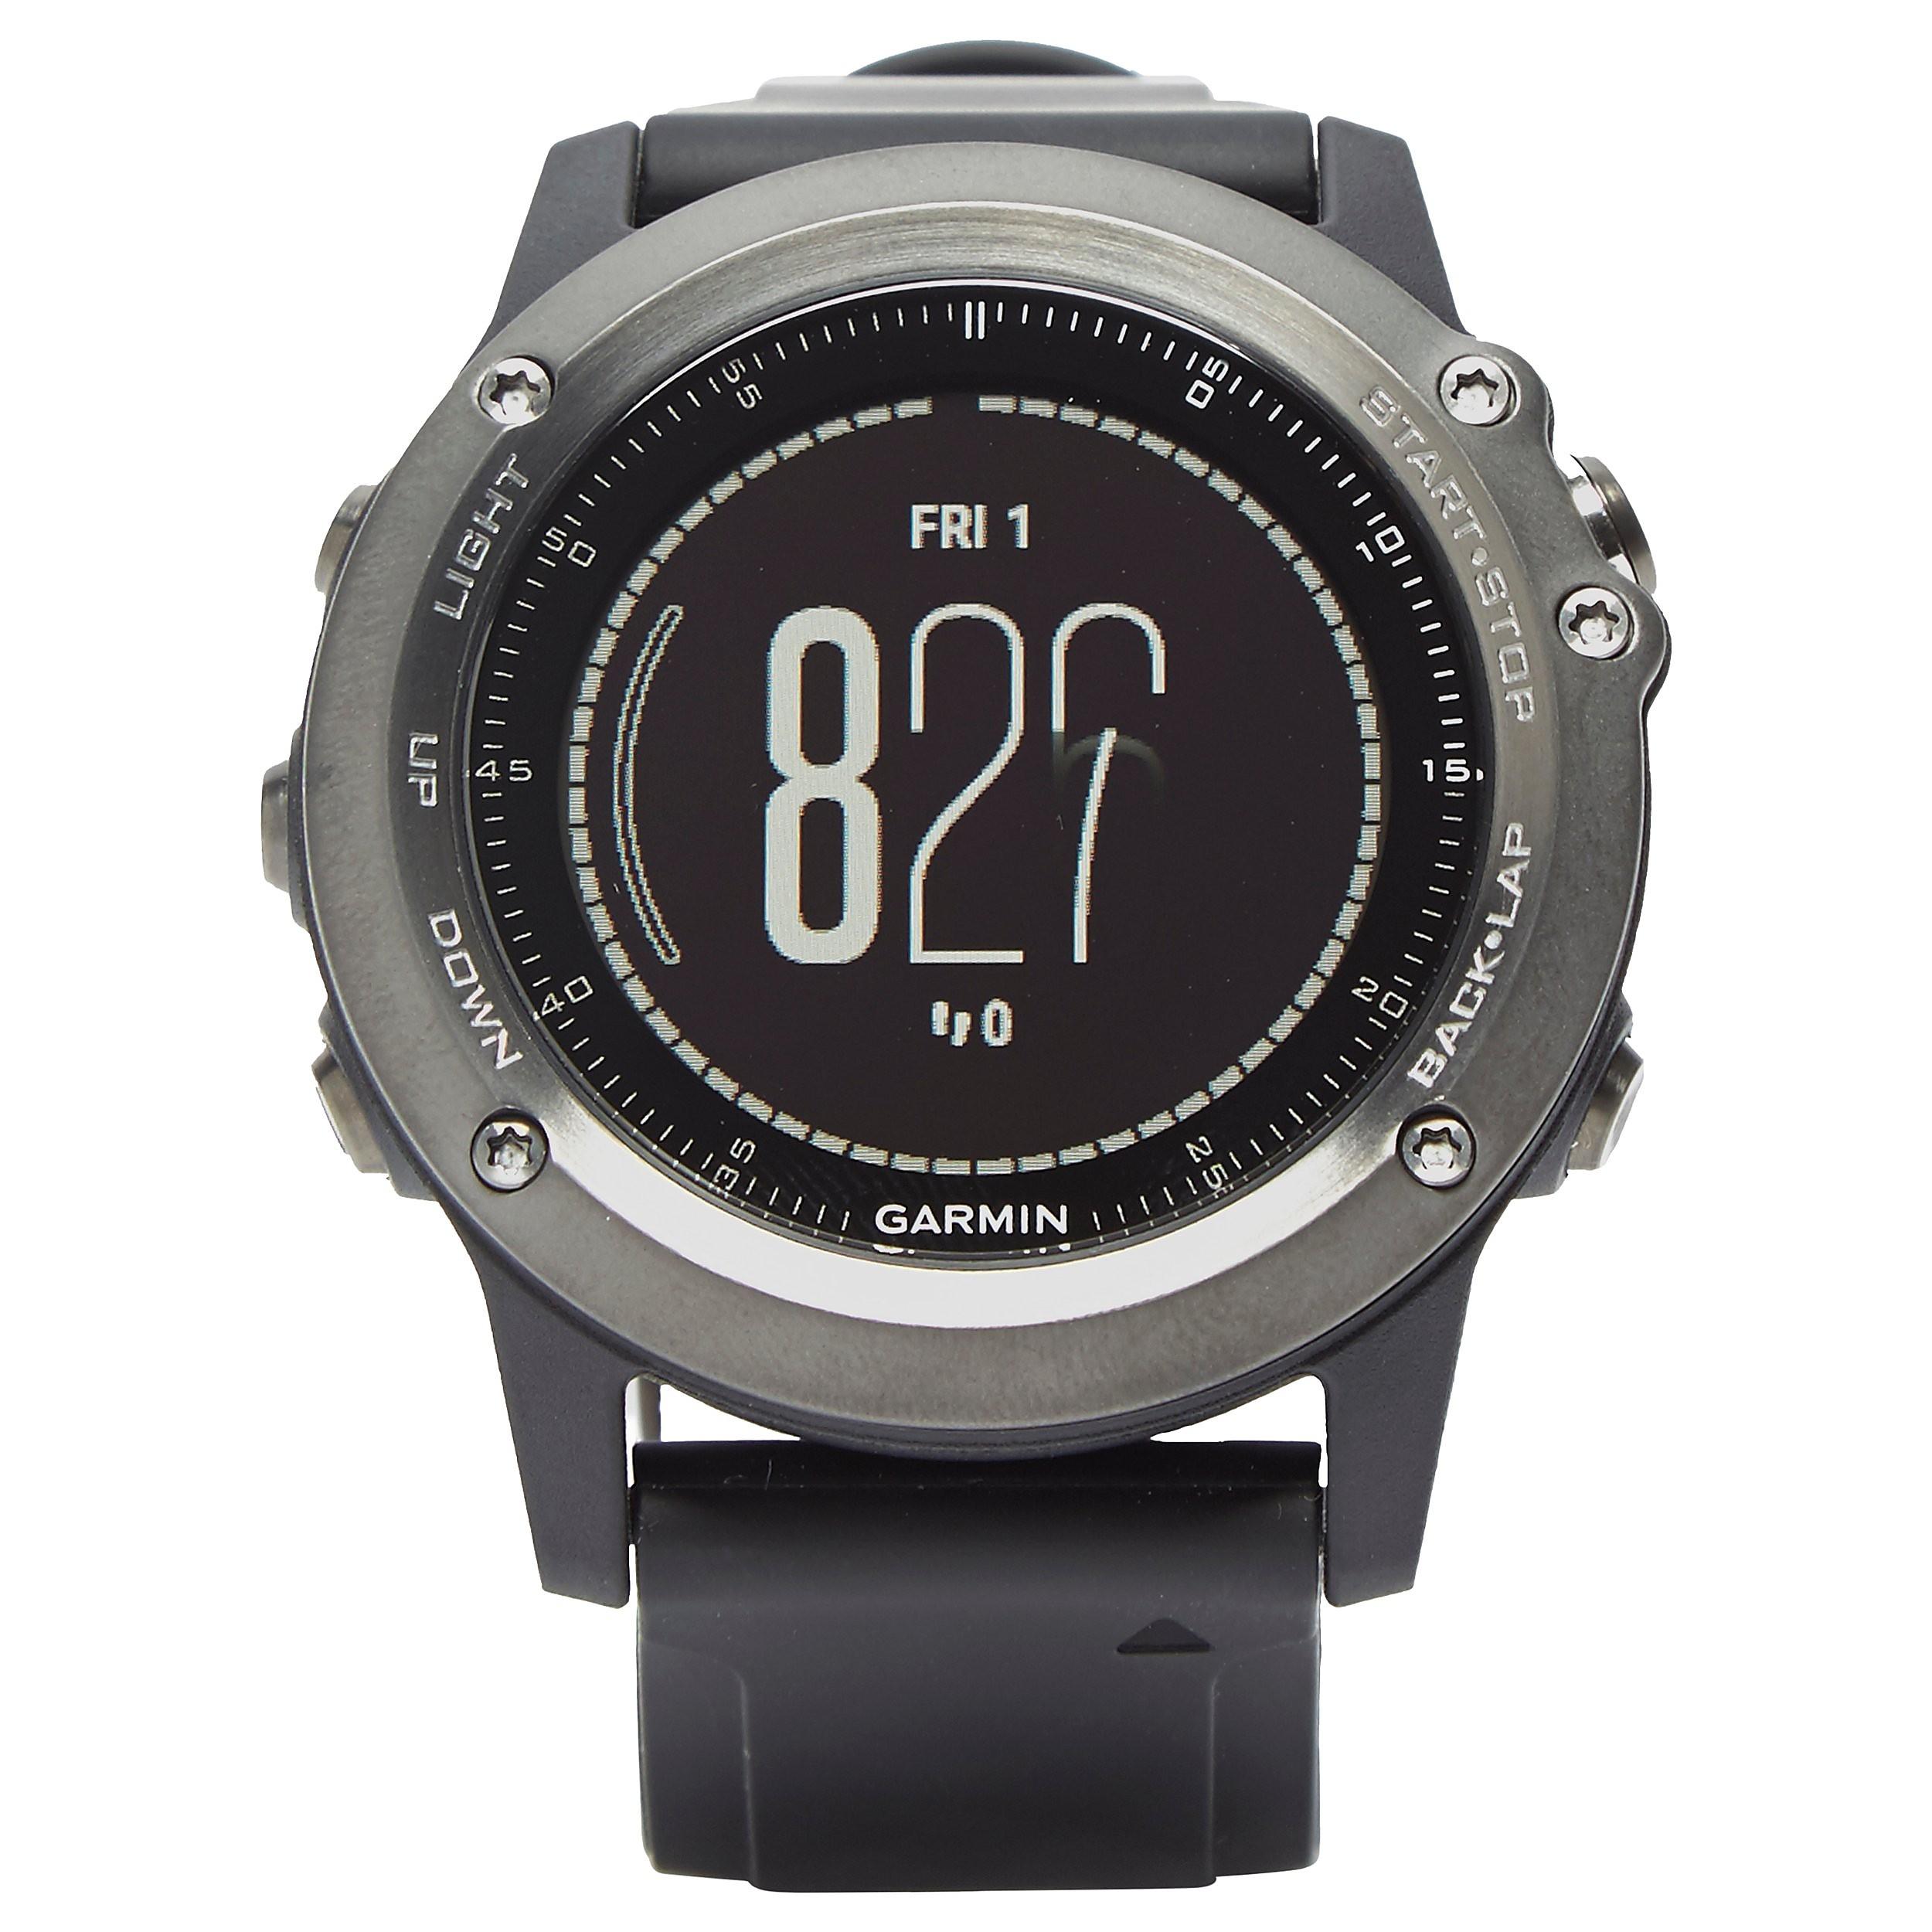 Garmin FENIX 3 HR SAPPHIRE GPS